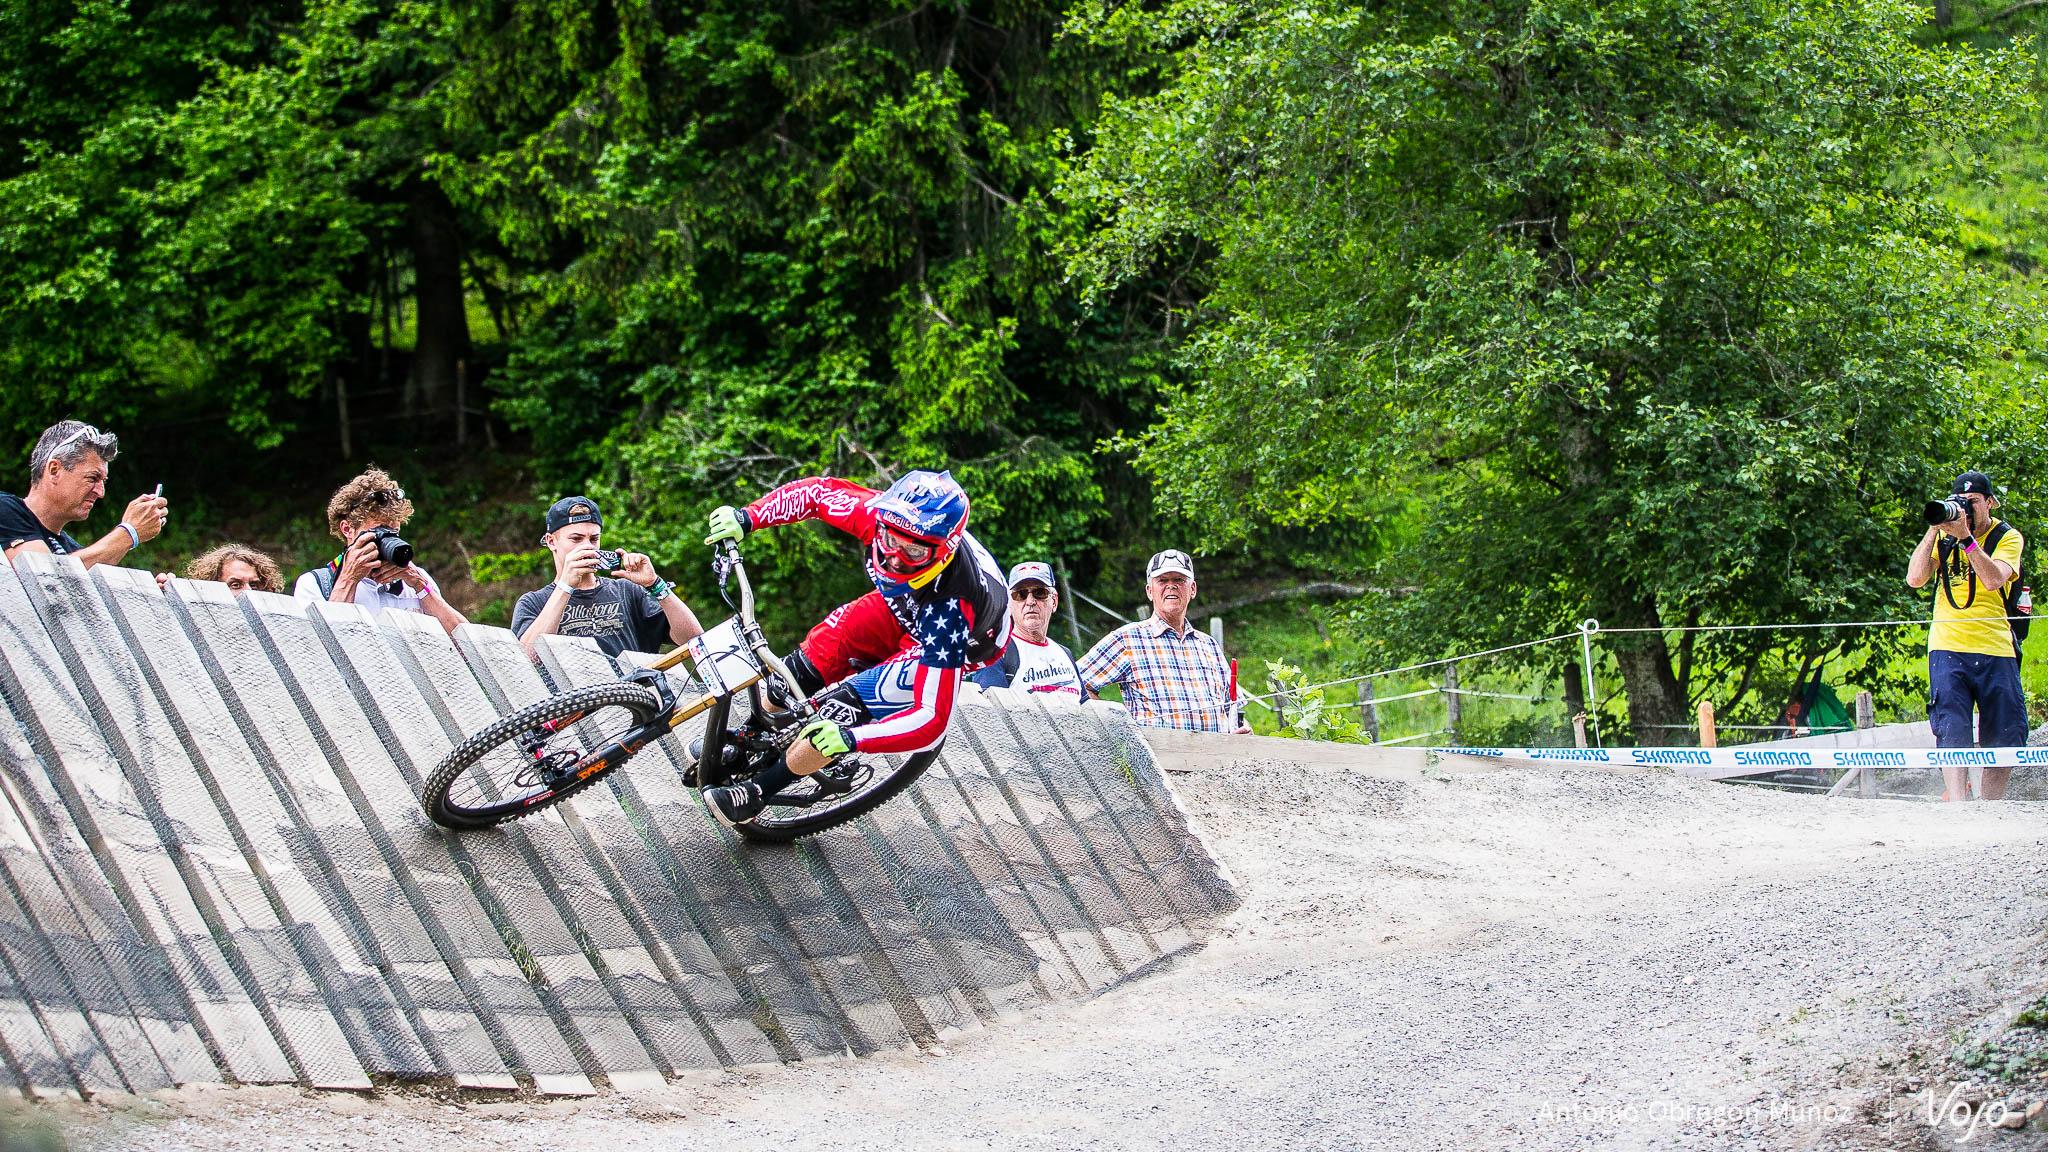 Leogang_UCI_World_Cup_DH_2015_(Porfolio)_(Gwin)_(Copyright_Antonio_Obregon_VojoMag-38